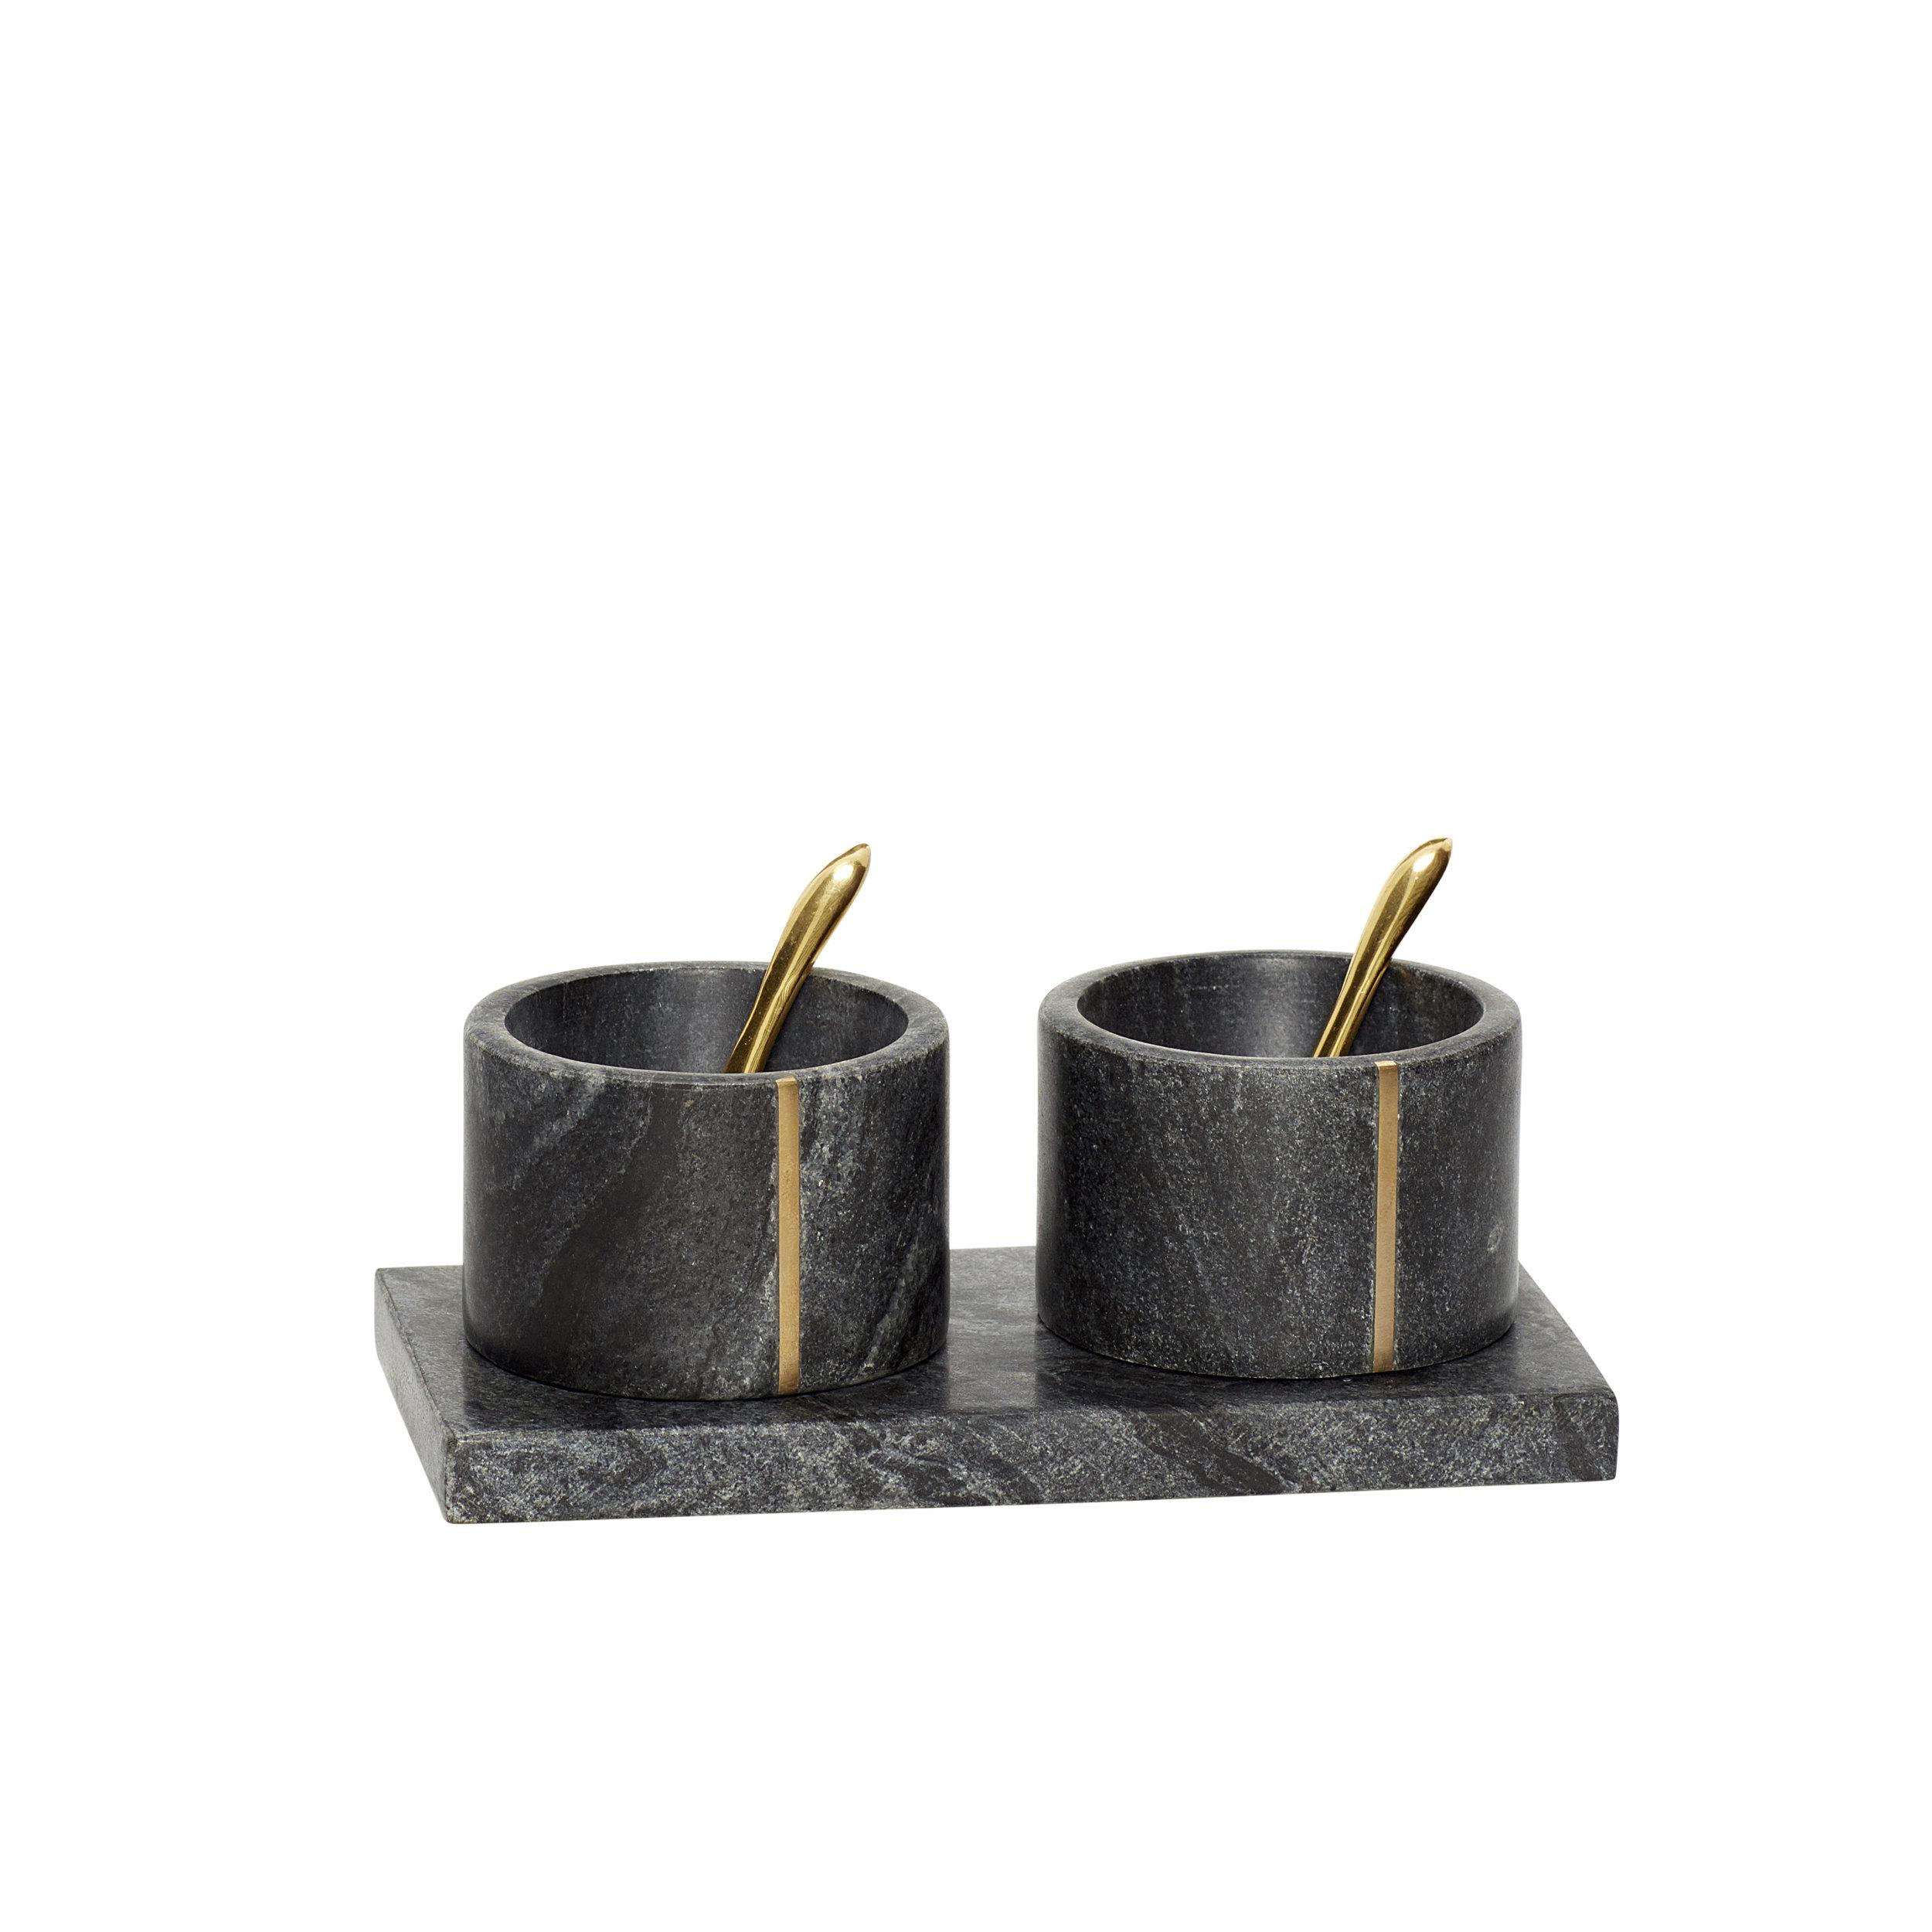 #017   Black Marble + Gold Spoon Serving Set   10cmx19cmxH:8cm Hire Price - £9 Minimum Order 3 Current Stock Available 12